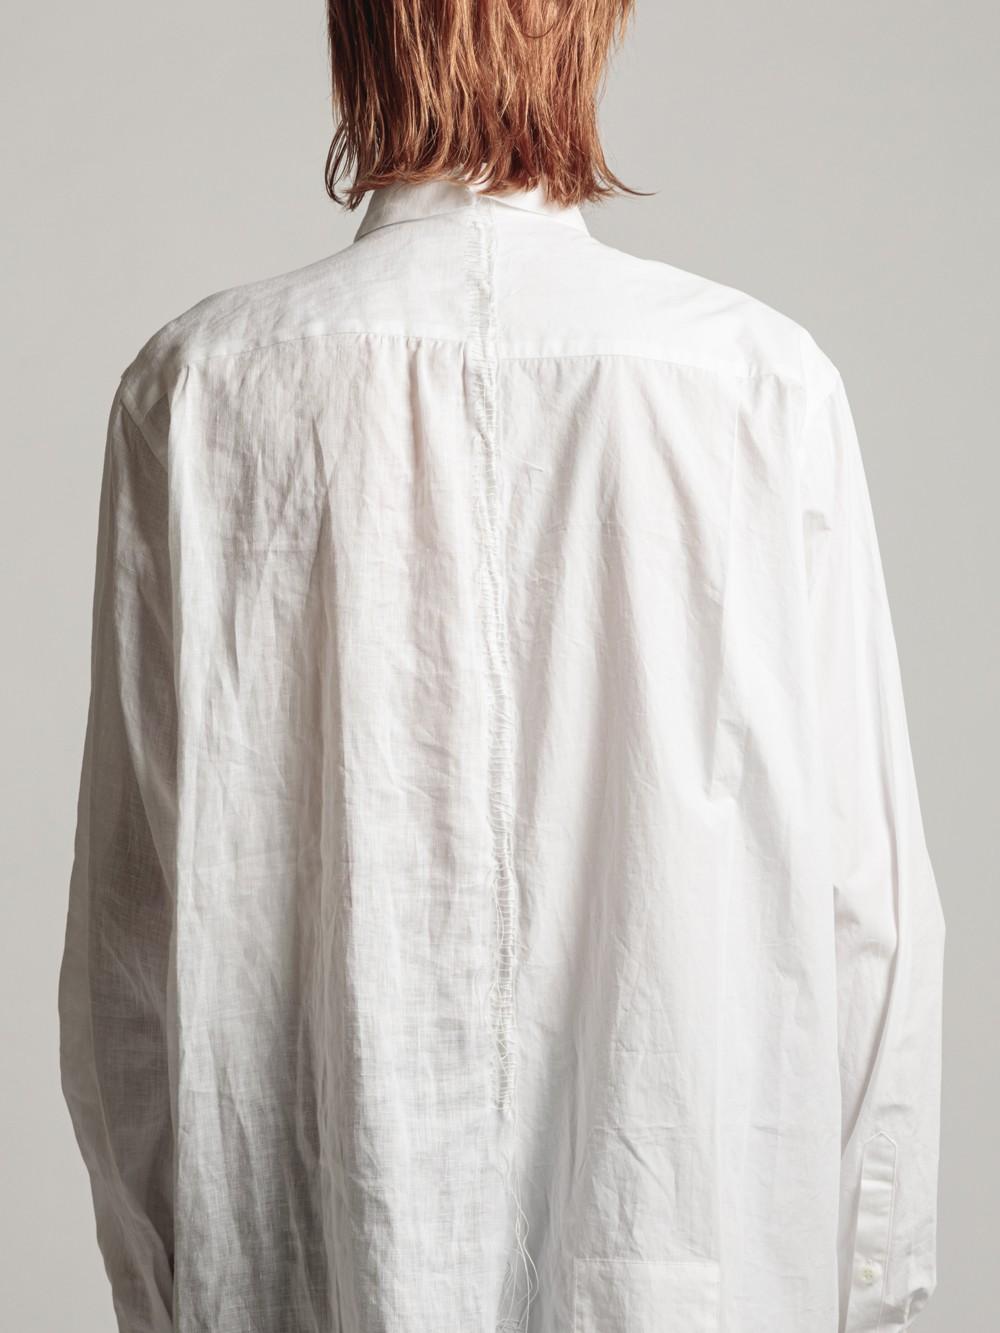 ODD-FABRIC SHIRTS